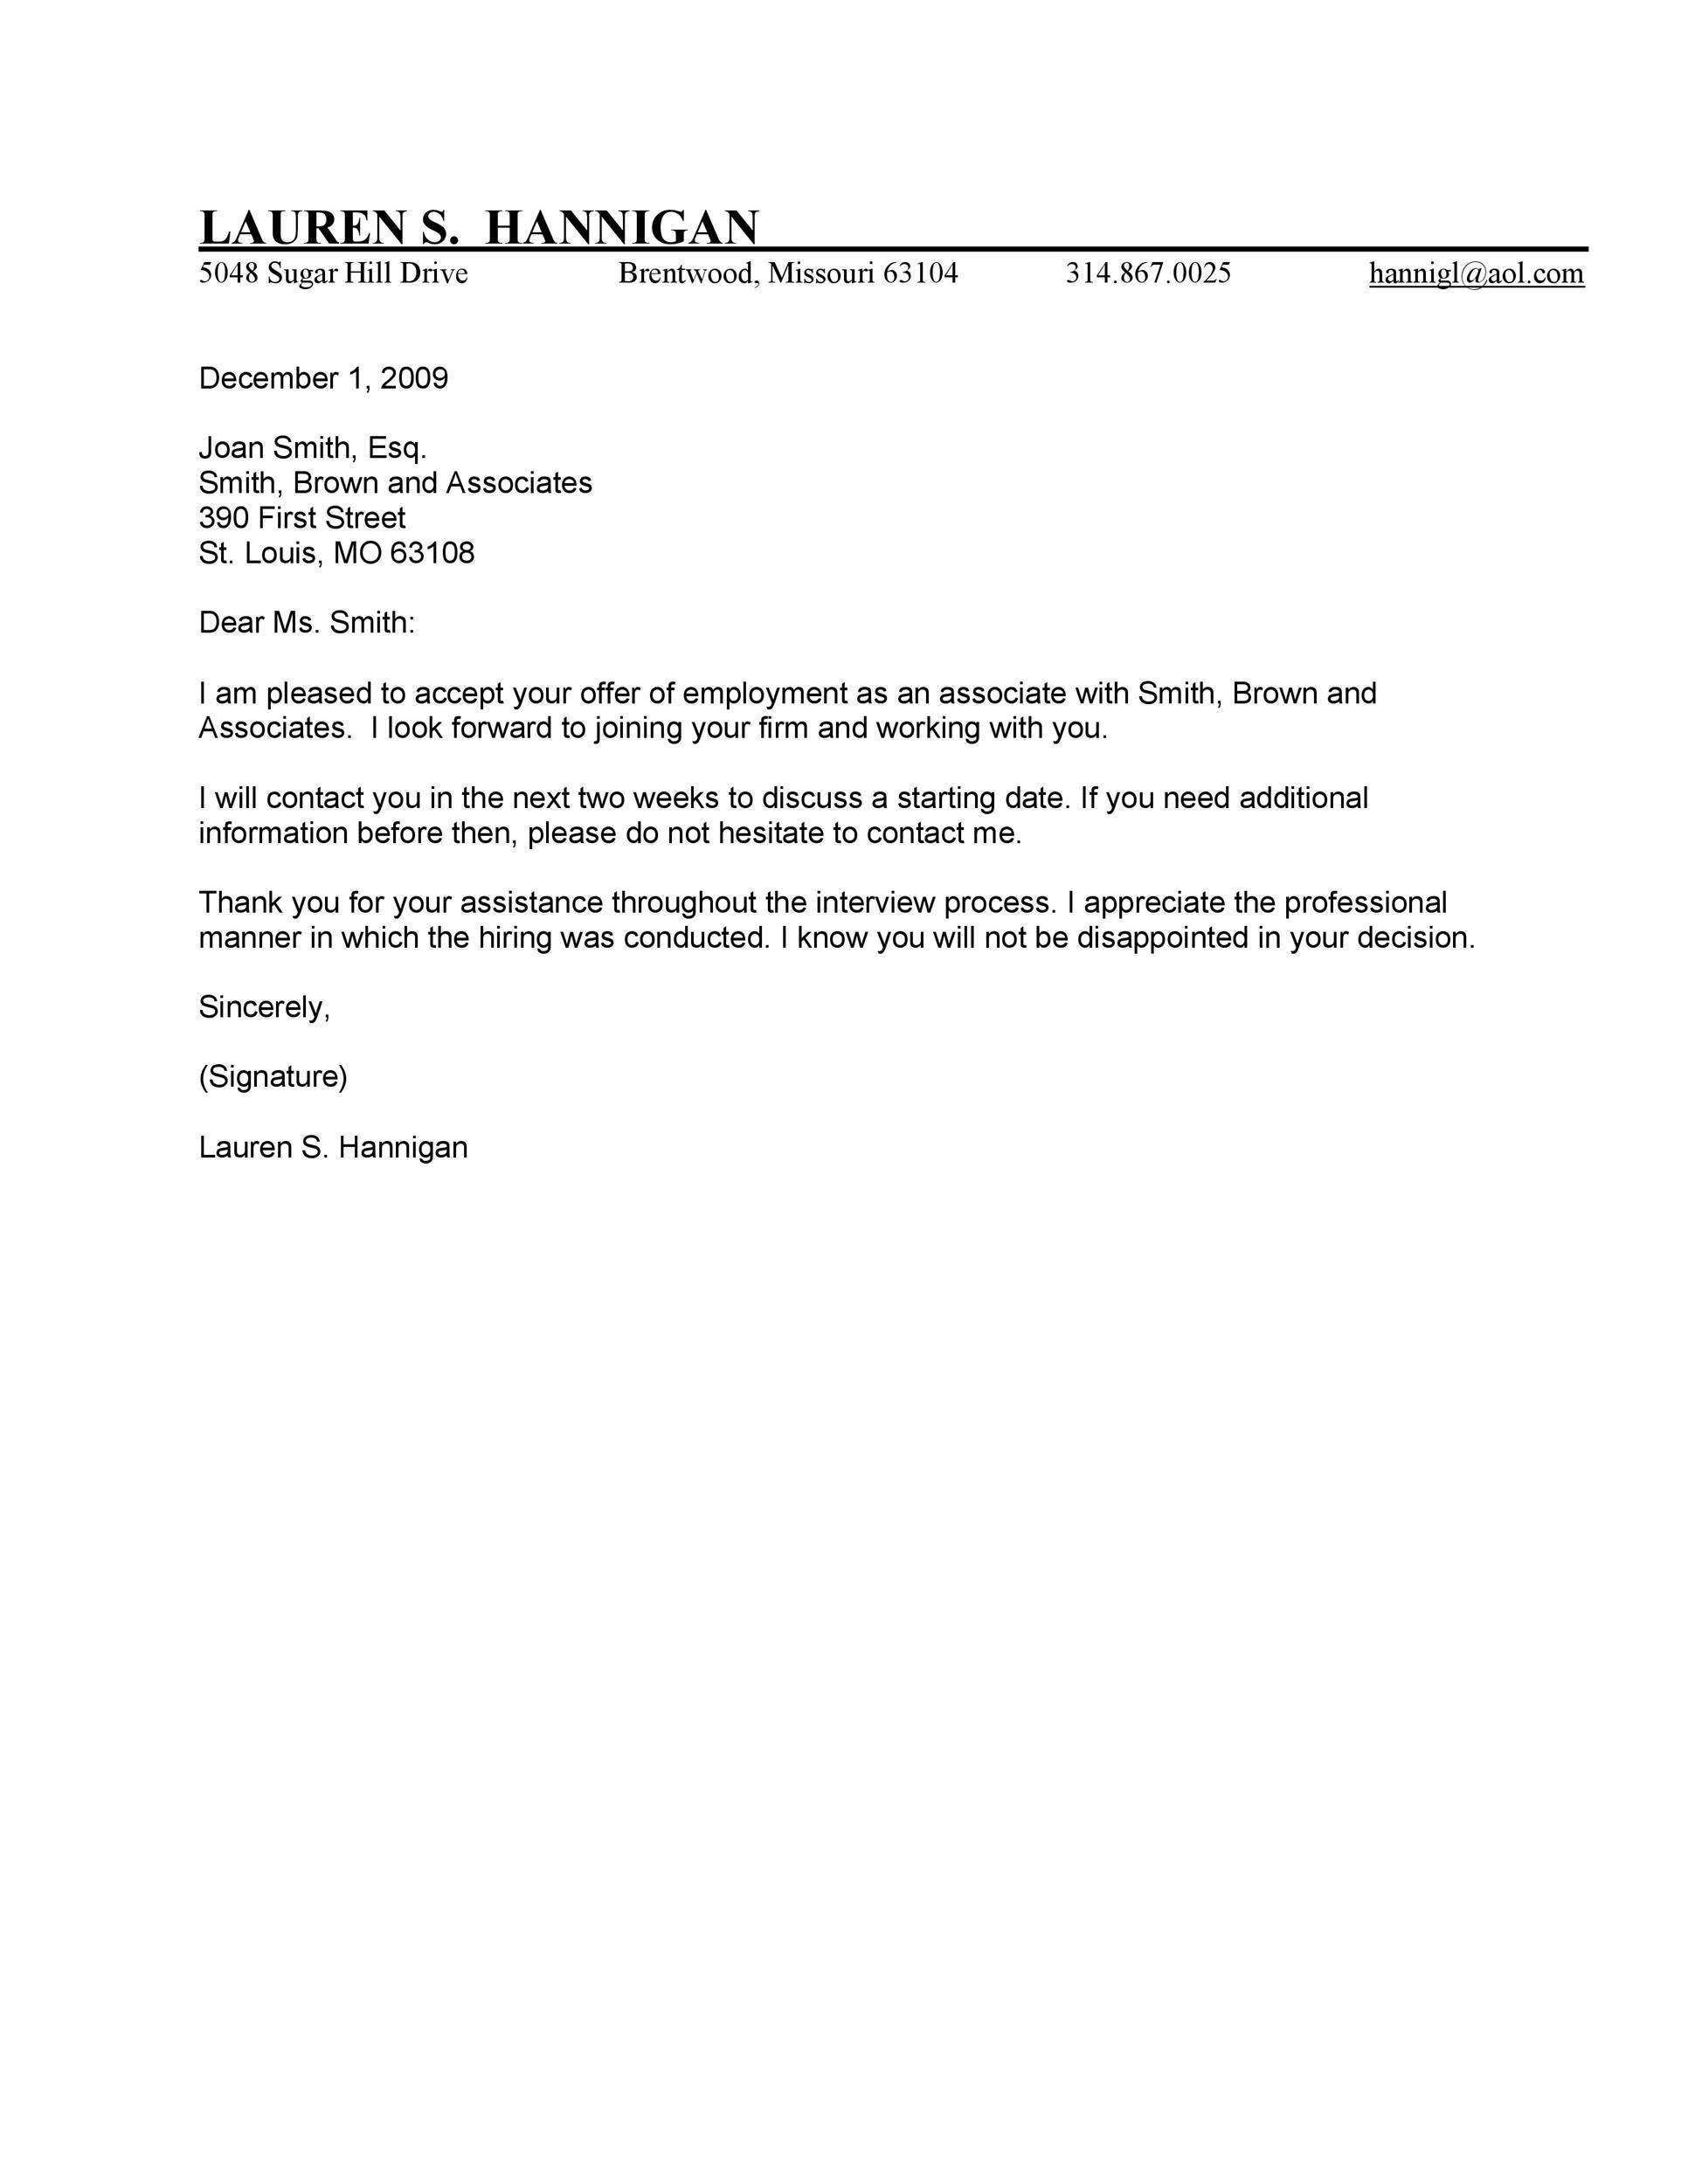 Free job acceptance letter 30